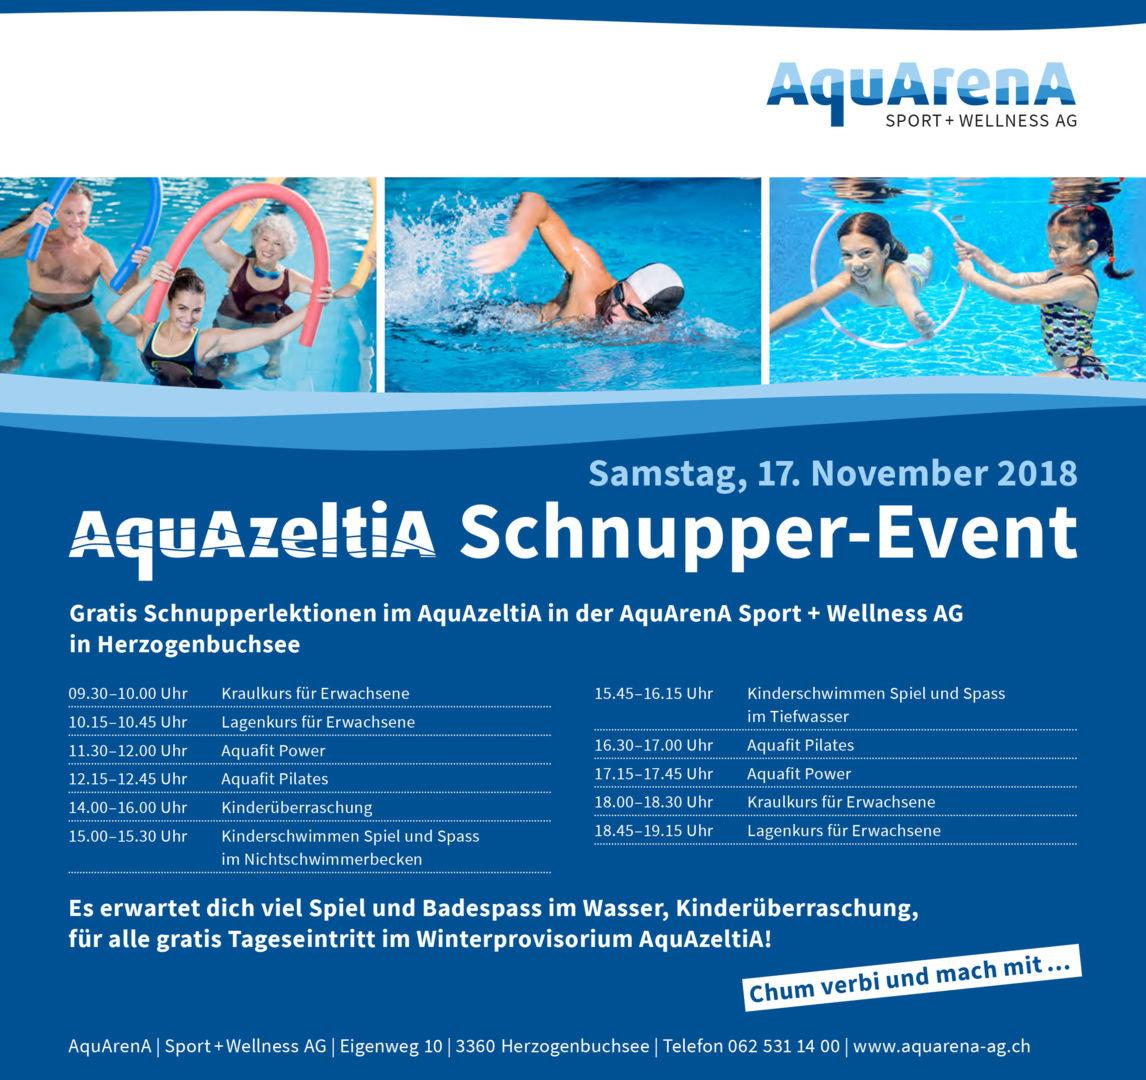 aquazeltia_schnuppertag_web.jpg